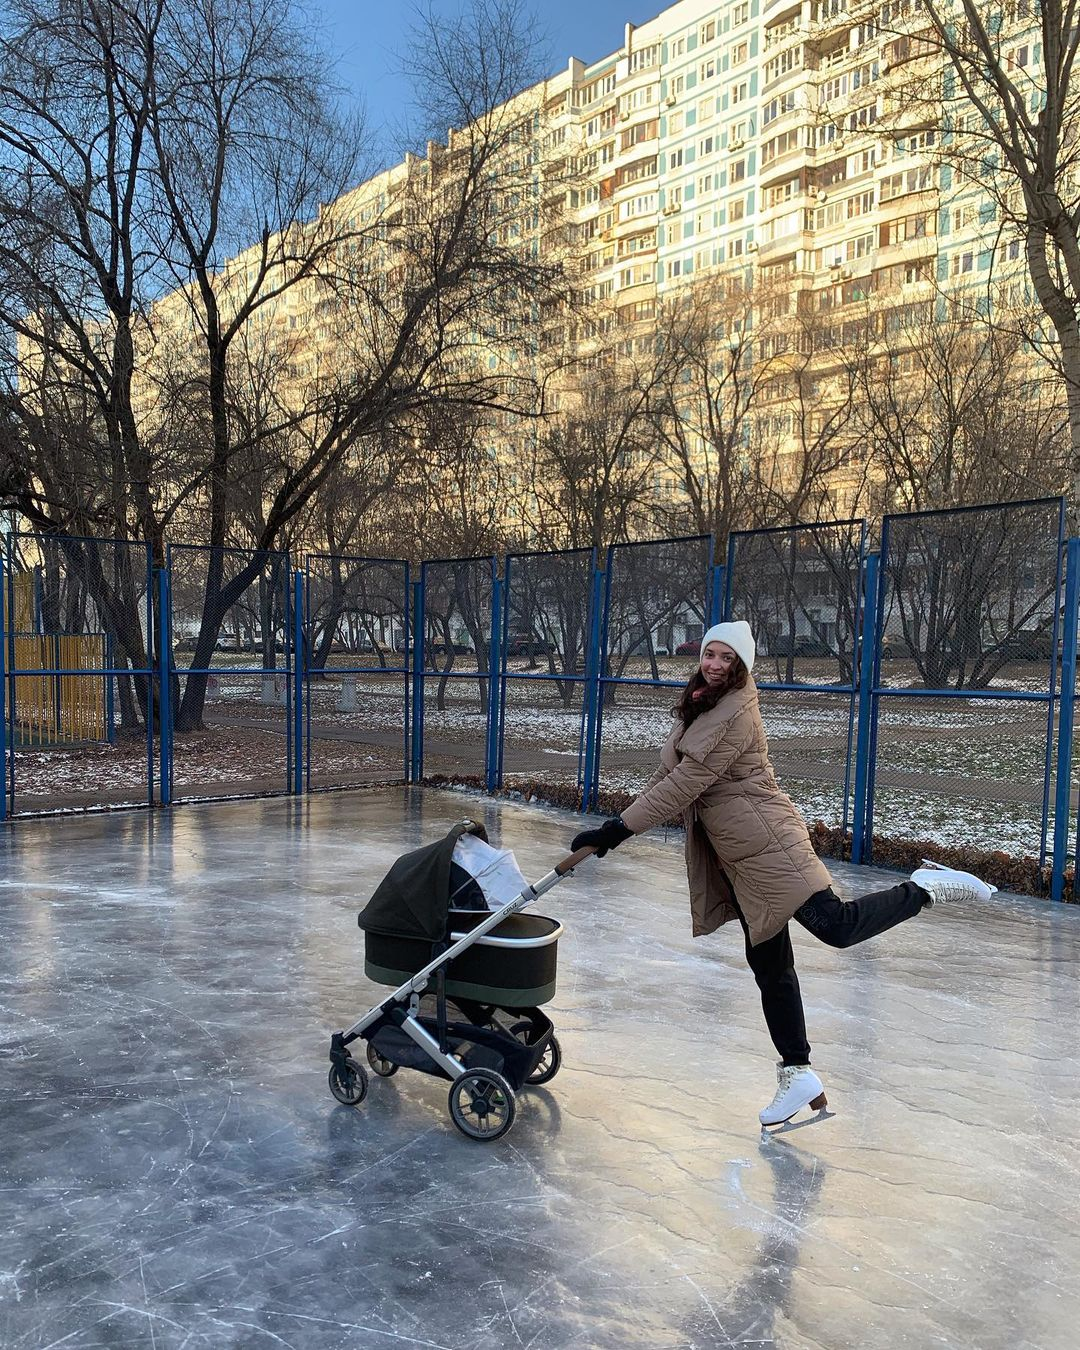 https://i3.imageban.ru/out/2020/12/12/f41ab4232b803cddff33f4988610f78d.jpg